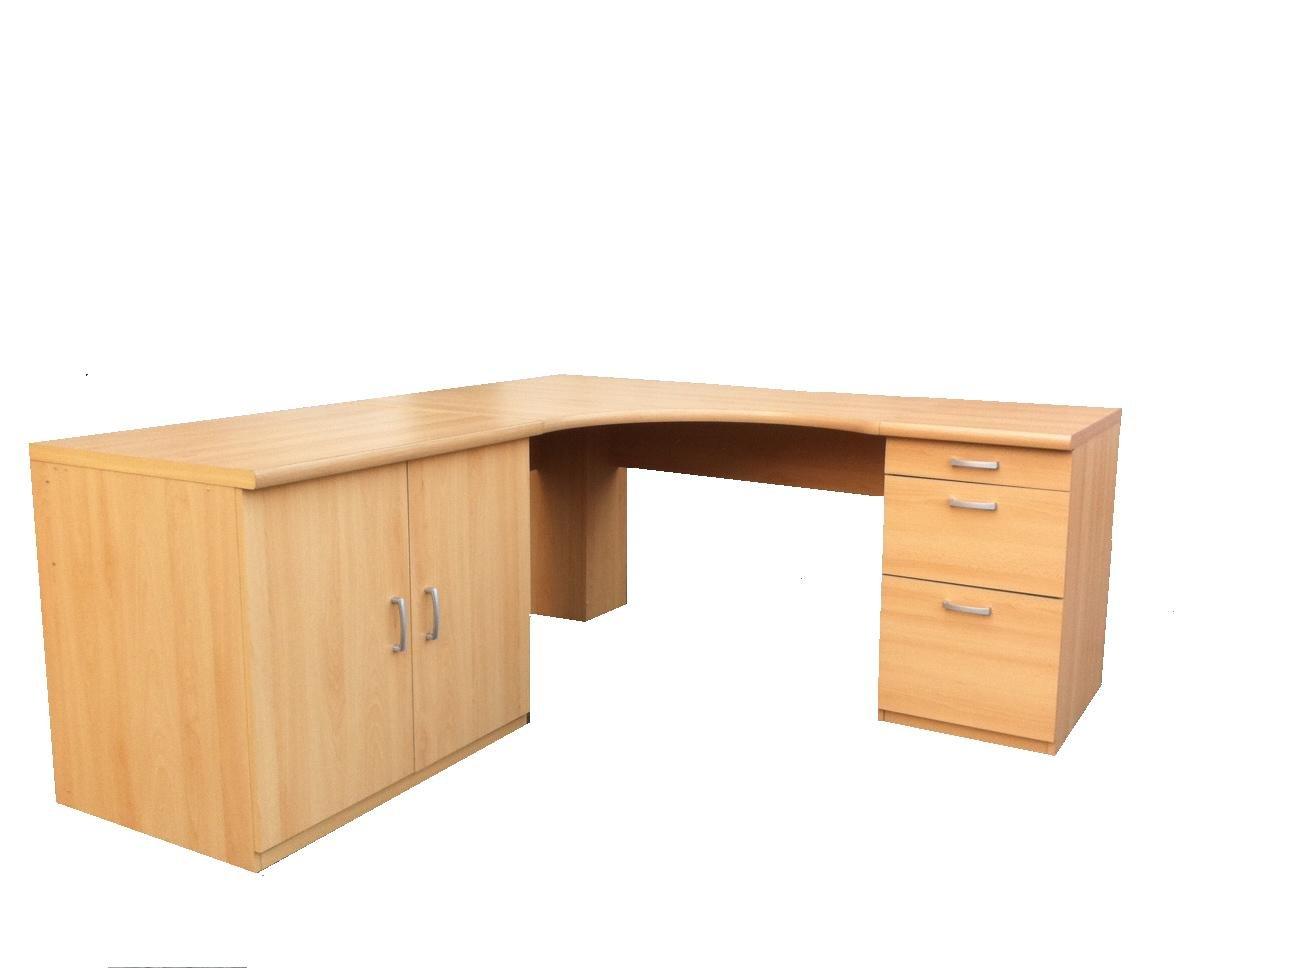 corner office tables. Morgan Beech Large Corner Computer Desk Office Table Option 7 - UK ONLY: Amazon.co.uk: Kitchen \u0026 Home Tables E